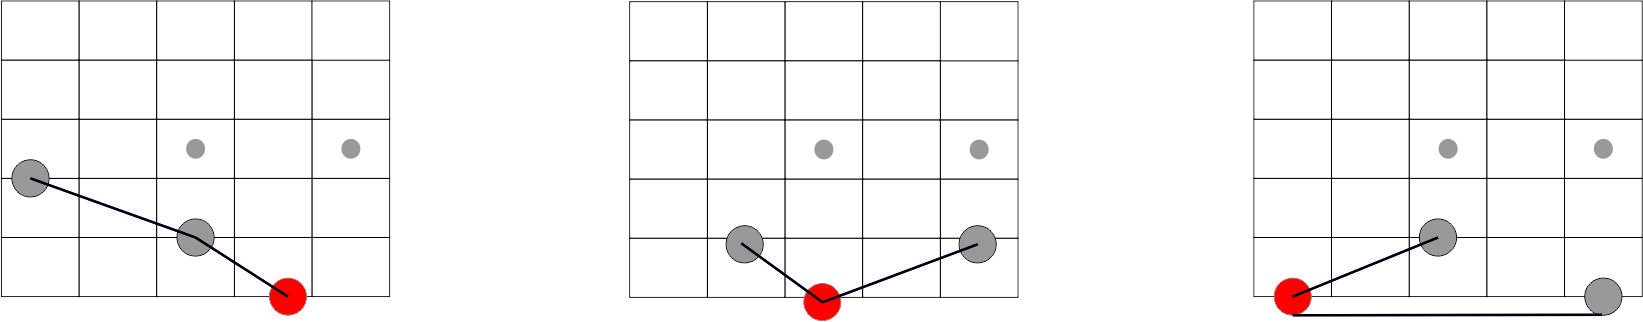 Conocer el diapasón de la guitarra